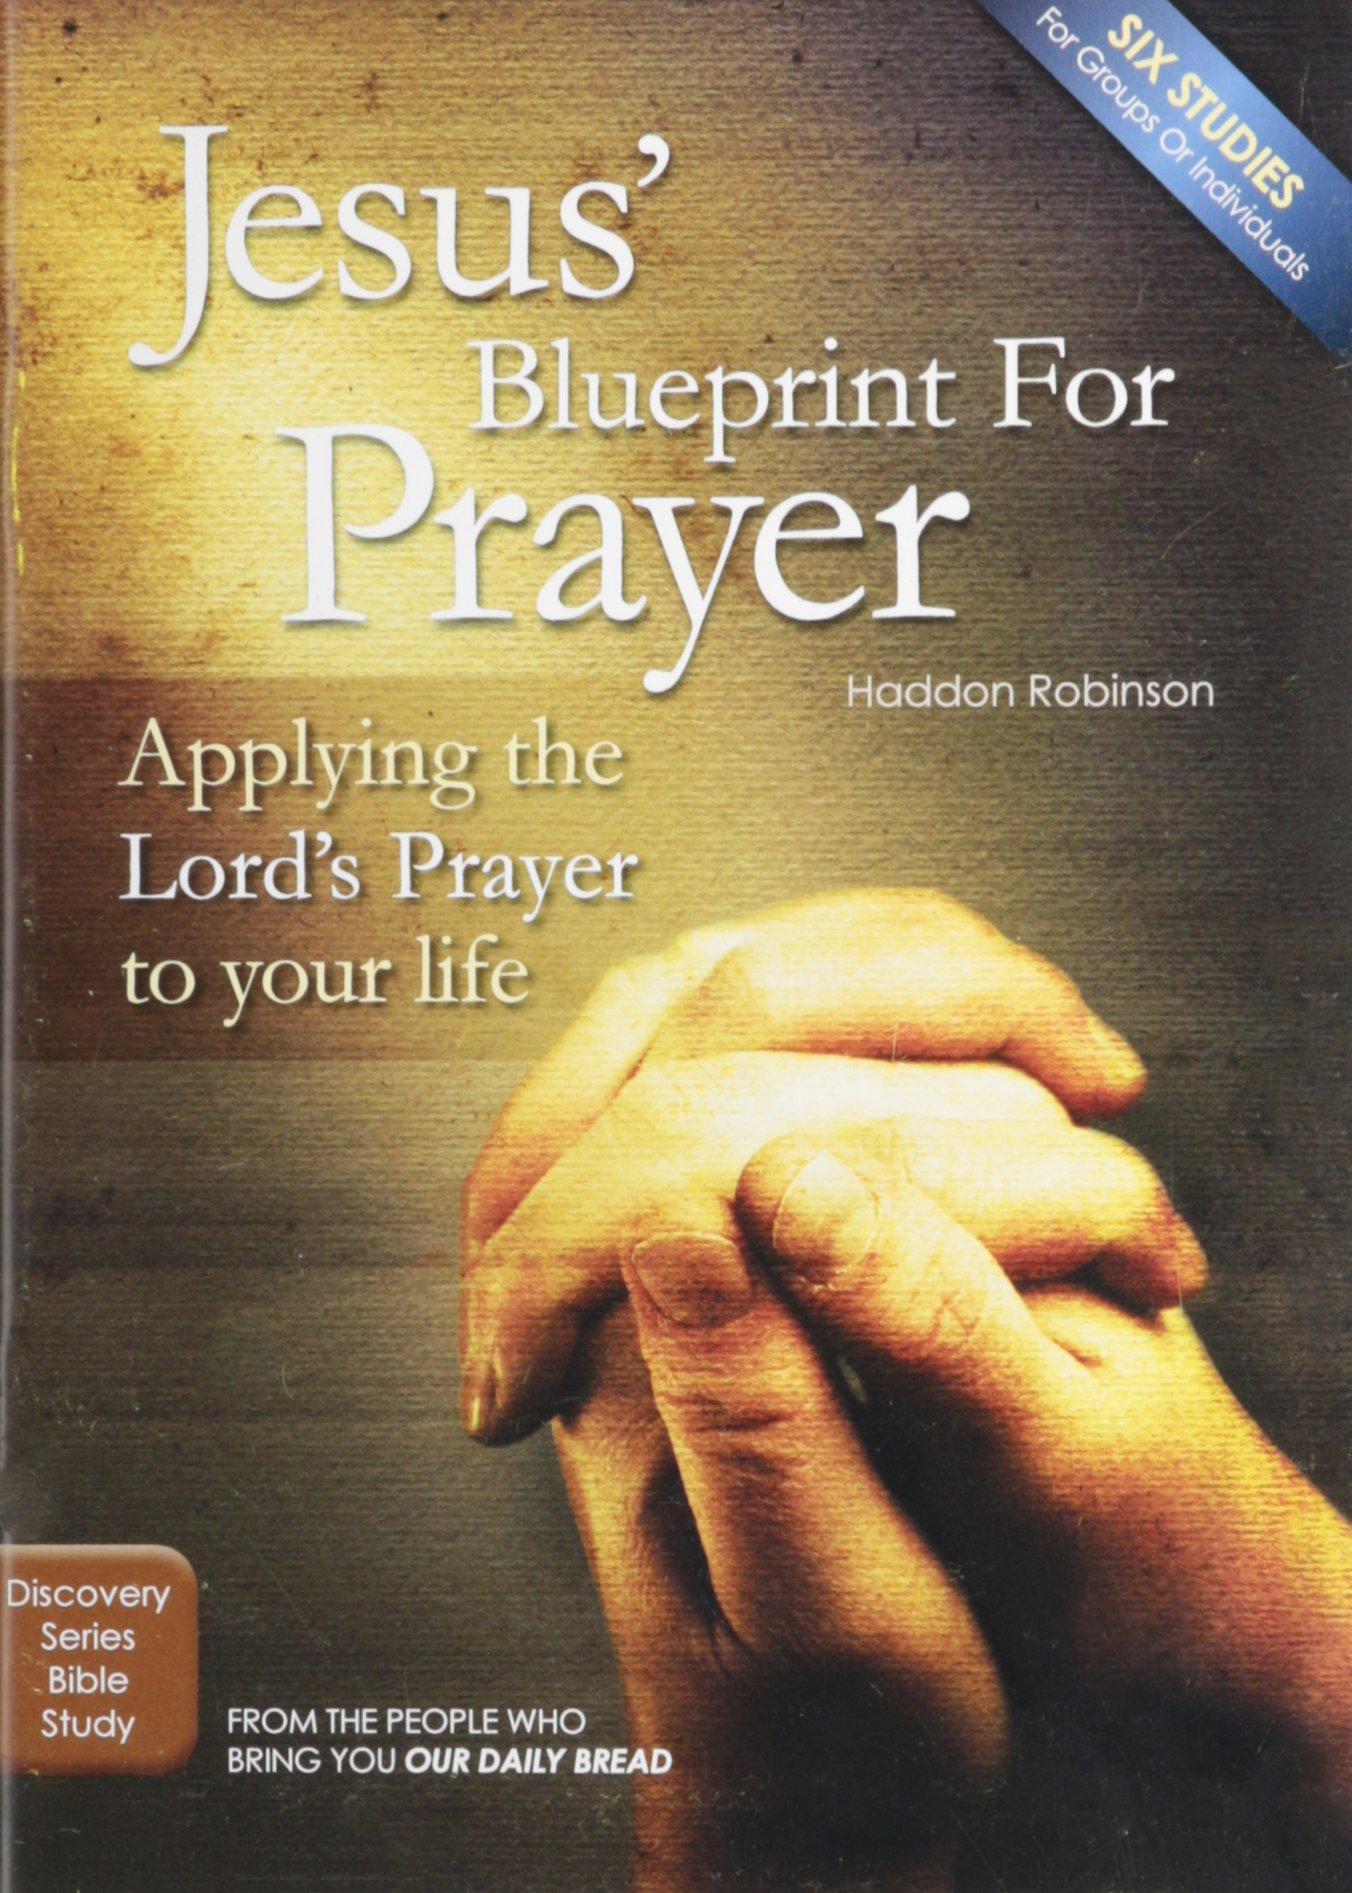 jesus u0027 blueprint for prayer applying the lord u0027s prayer to your